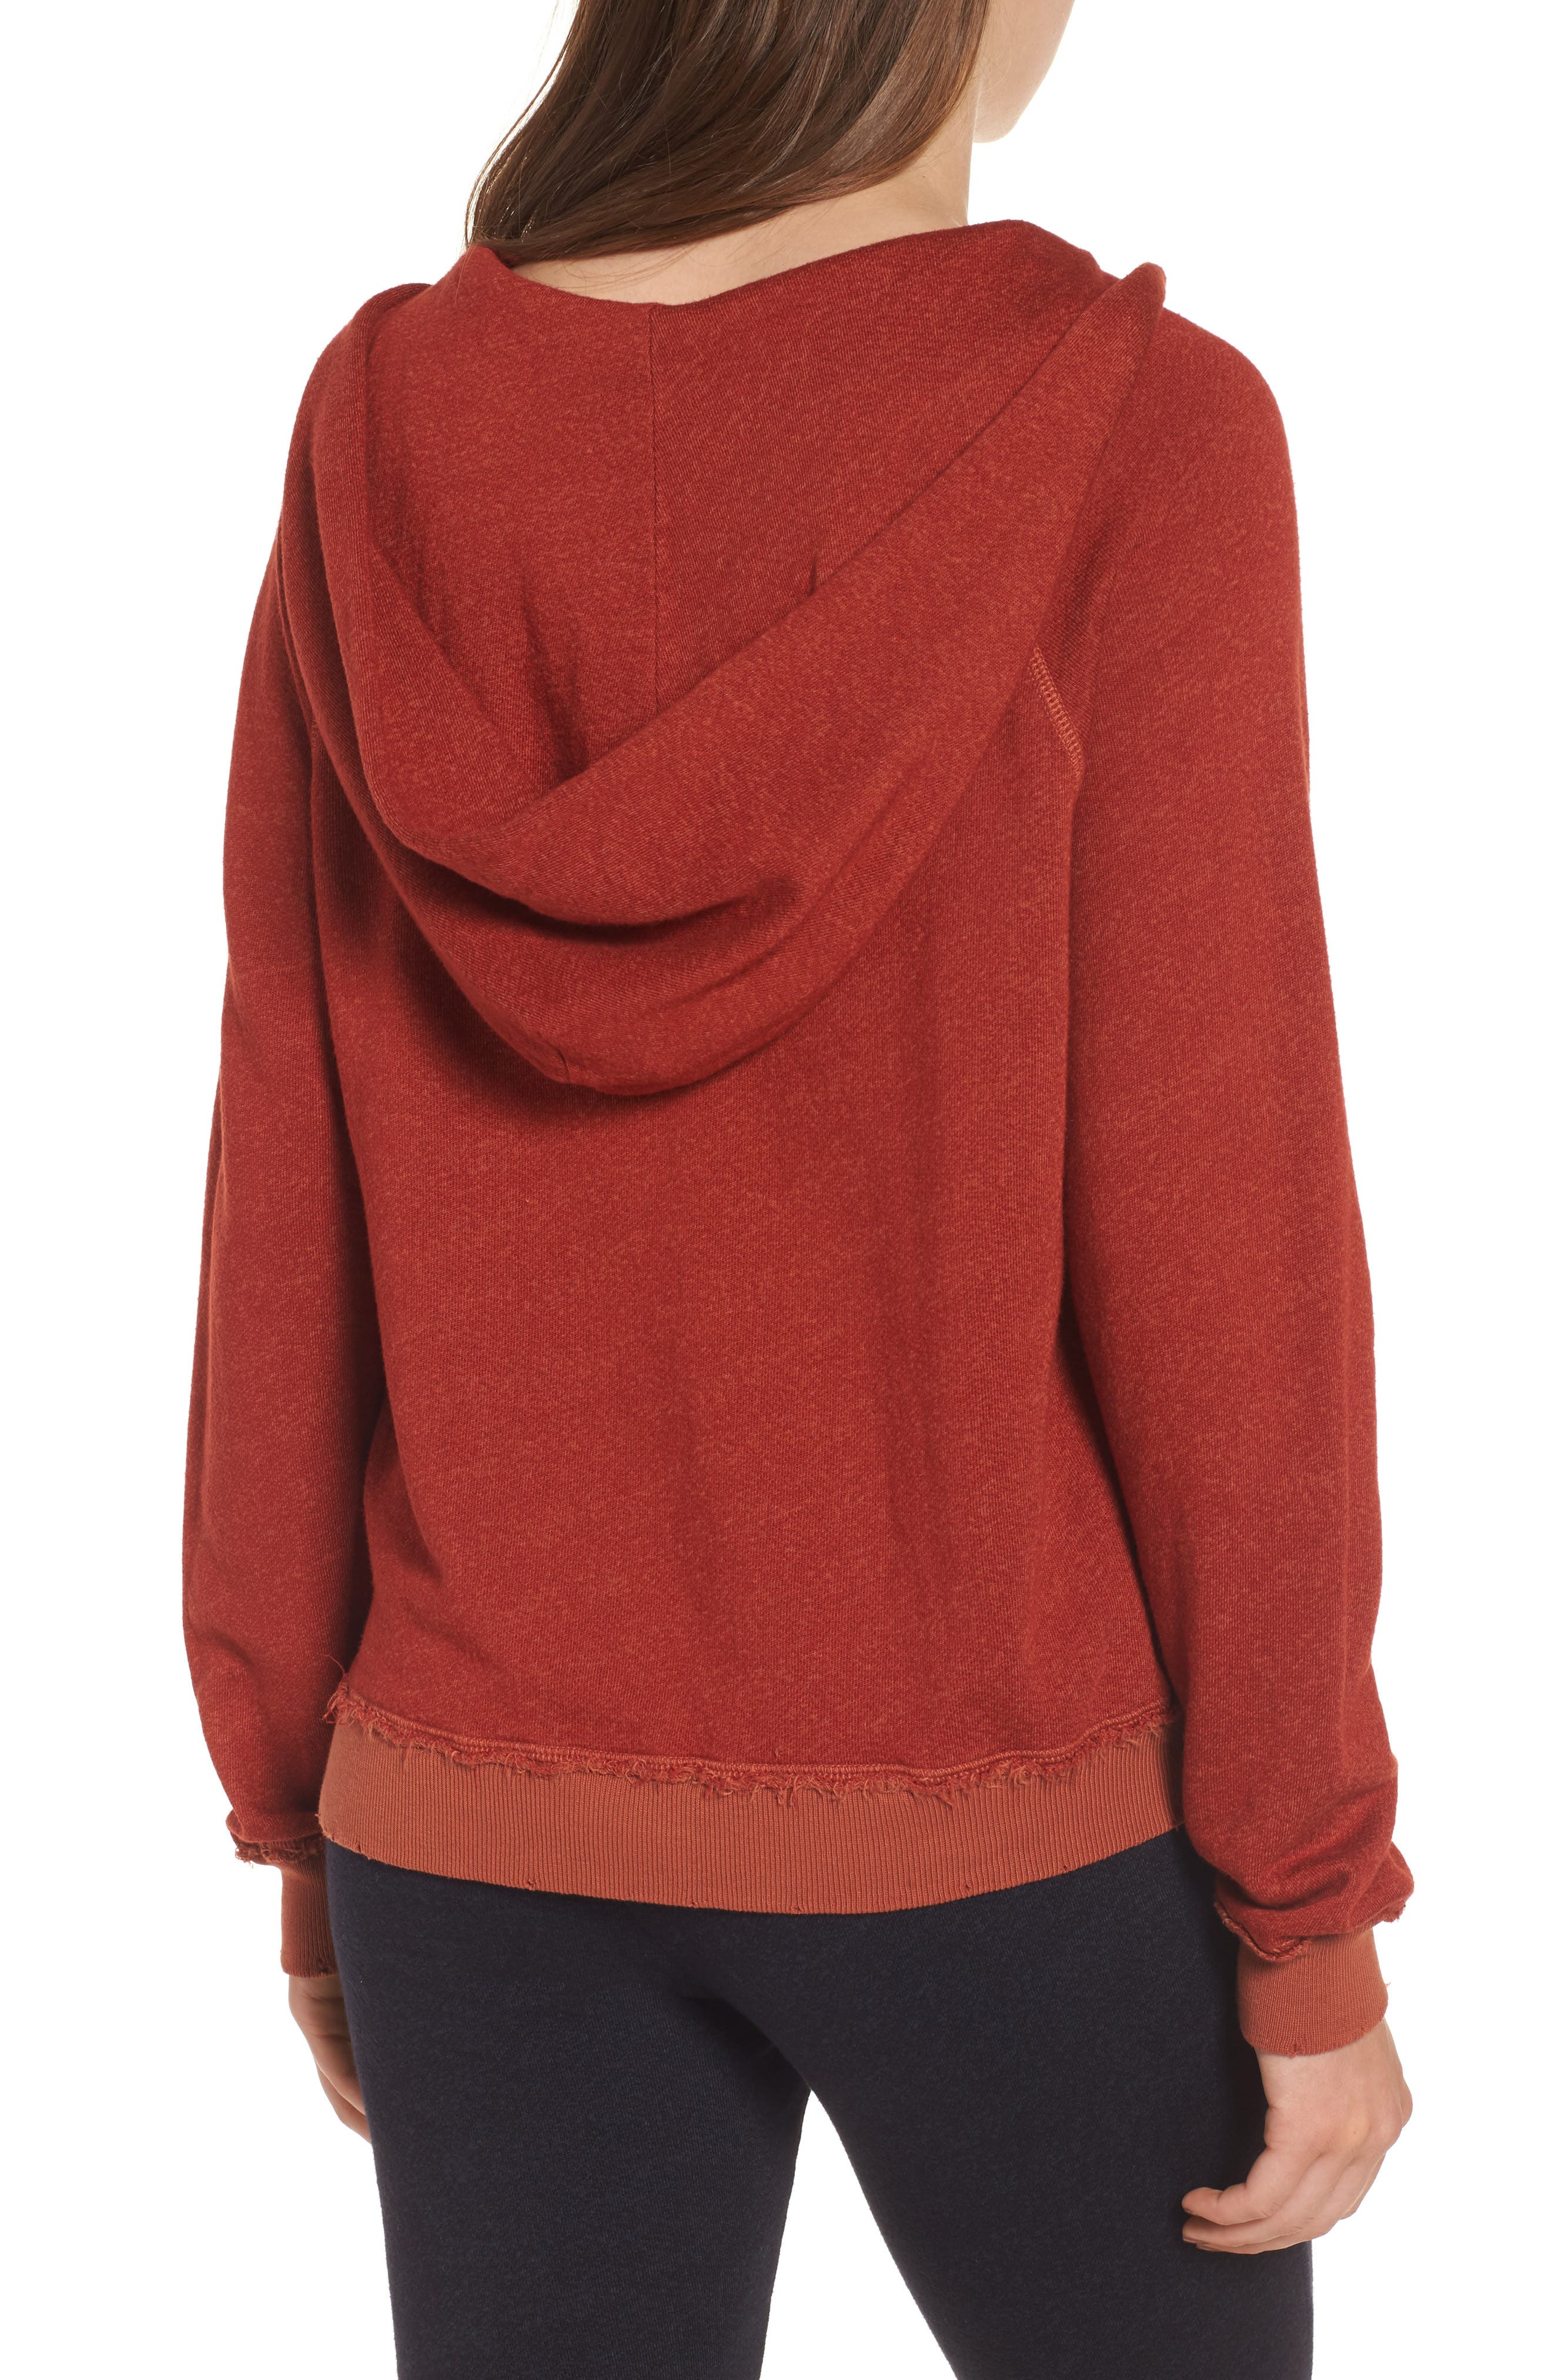 Penny Hooded Sweatshirt,                             Alternate thumbnail 2, color,                             639